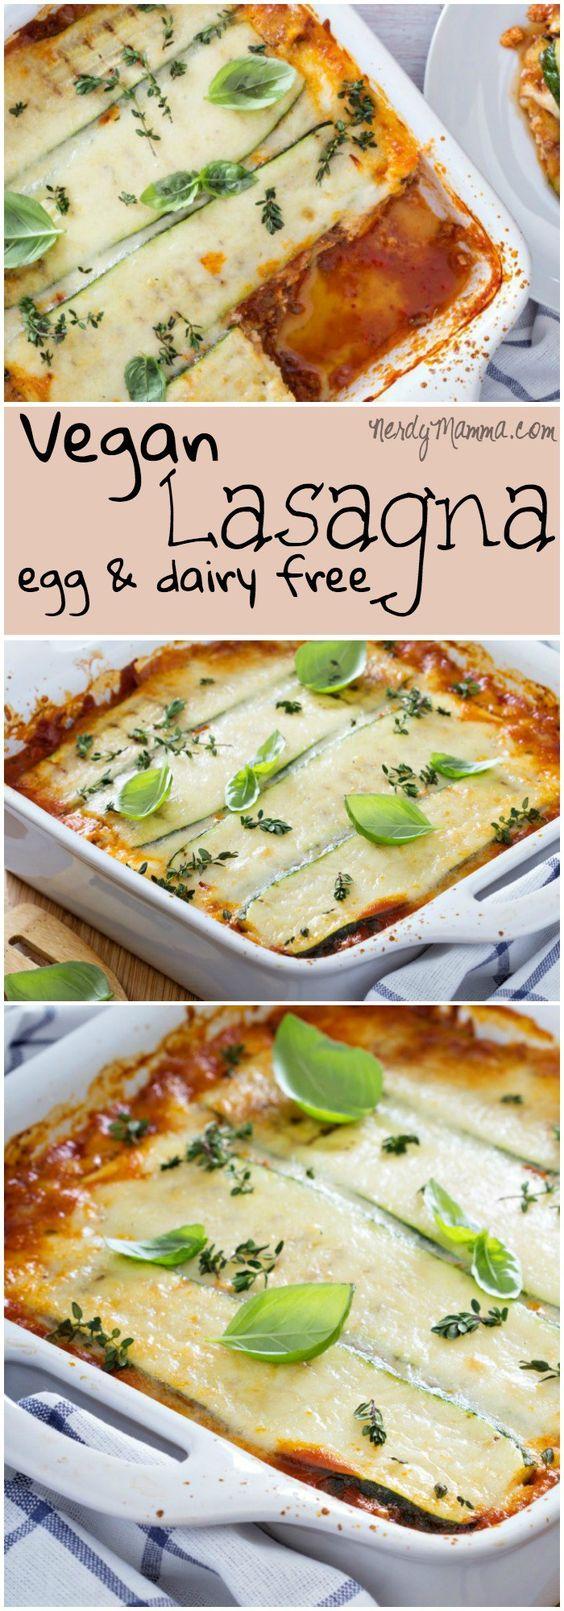 Vegan Lasagna (Dairy-Free & Egg-Free)  #vegan  Entdeckt von www.vegaliferocks.de✨ I Fleischlos glücklich, fit & Gesund✨ I Follow me for more inspiration  @ vegaliferocks